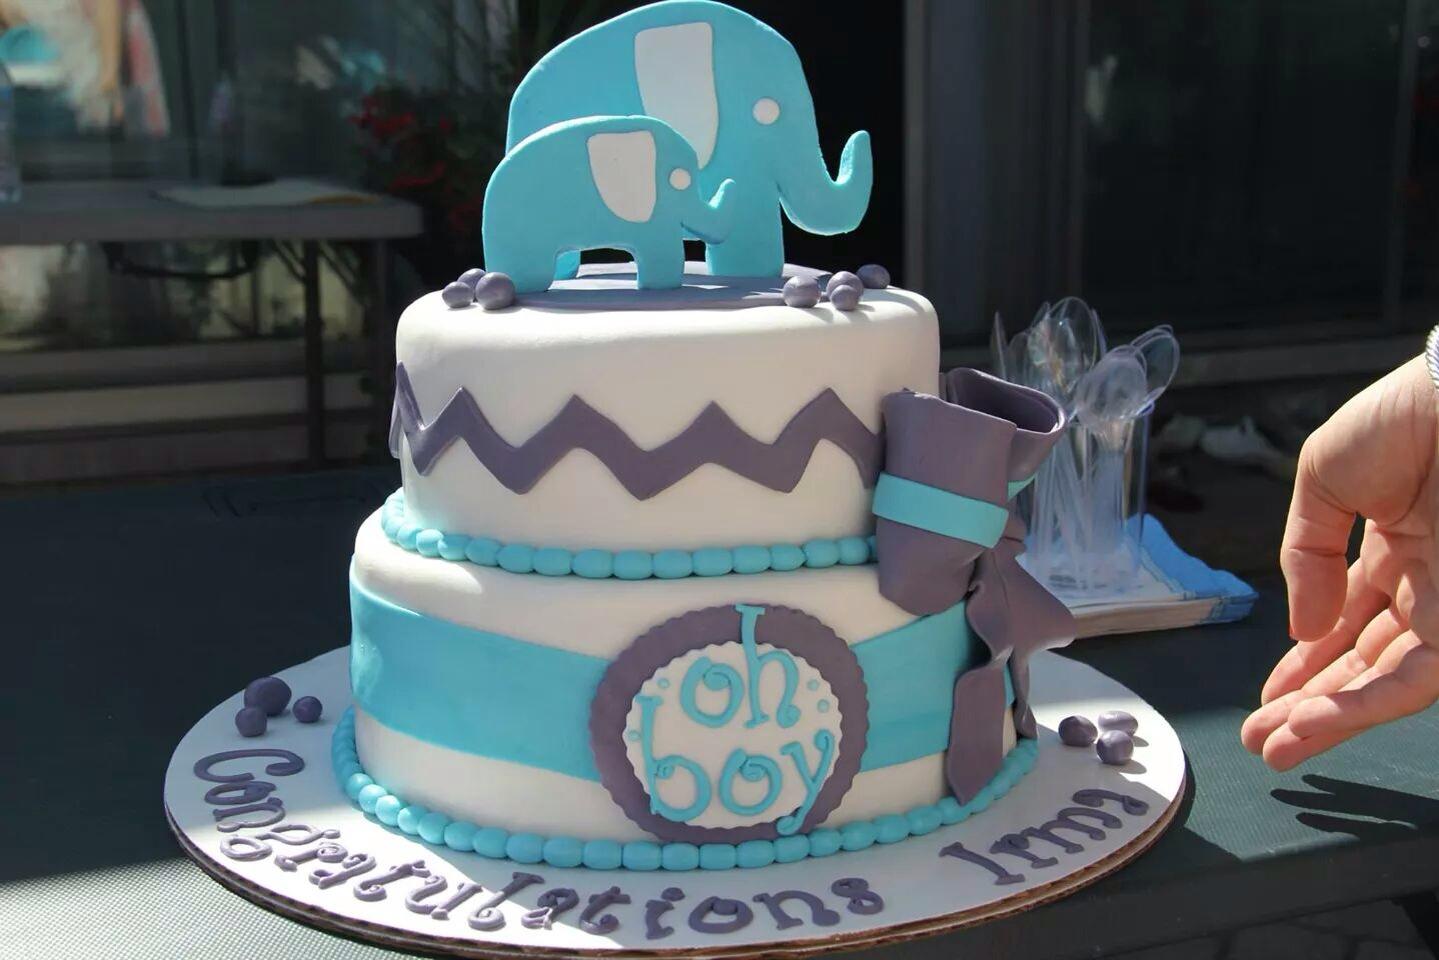 cupcake shower blue and amazon decor slp picks elephant food com elephants gray mixed toppers themed baby